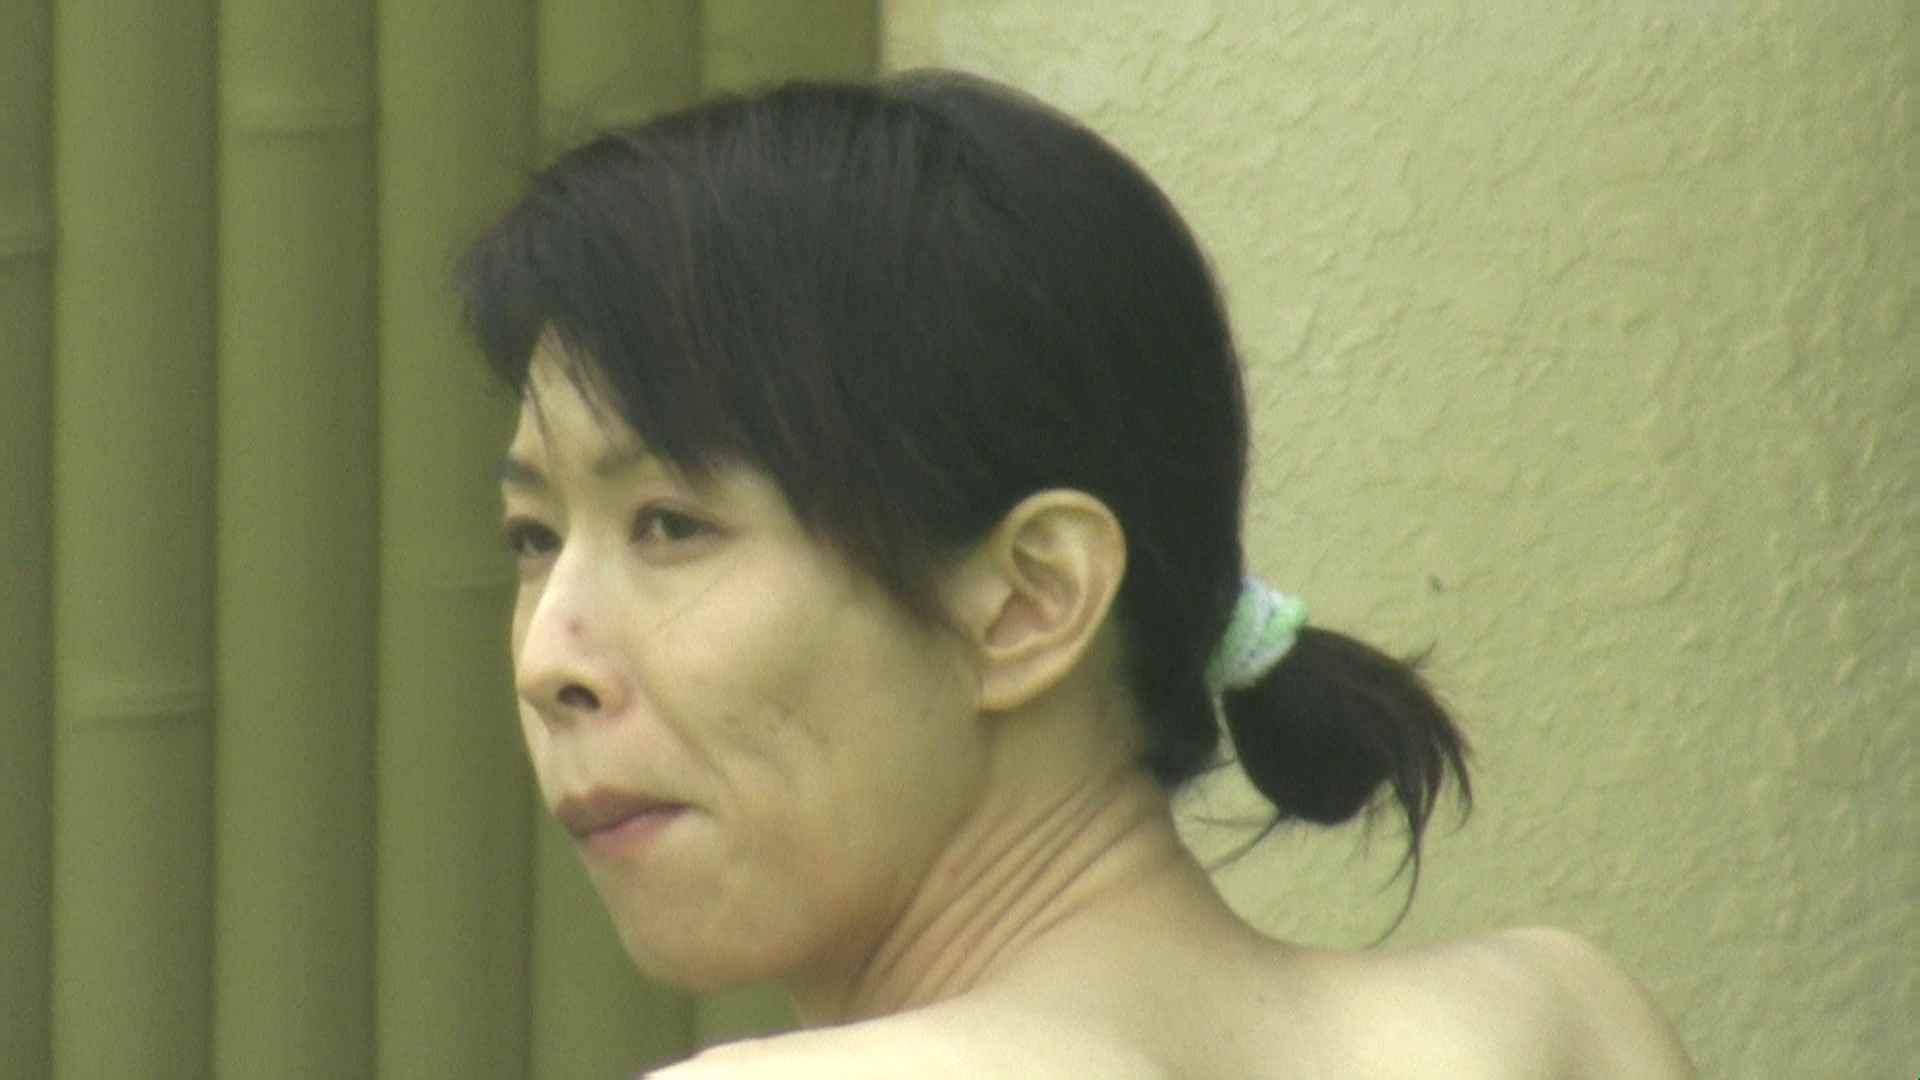 Aquaな露天風呂Vol.631 盗撮  109連発 75